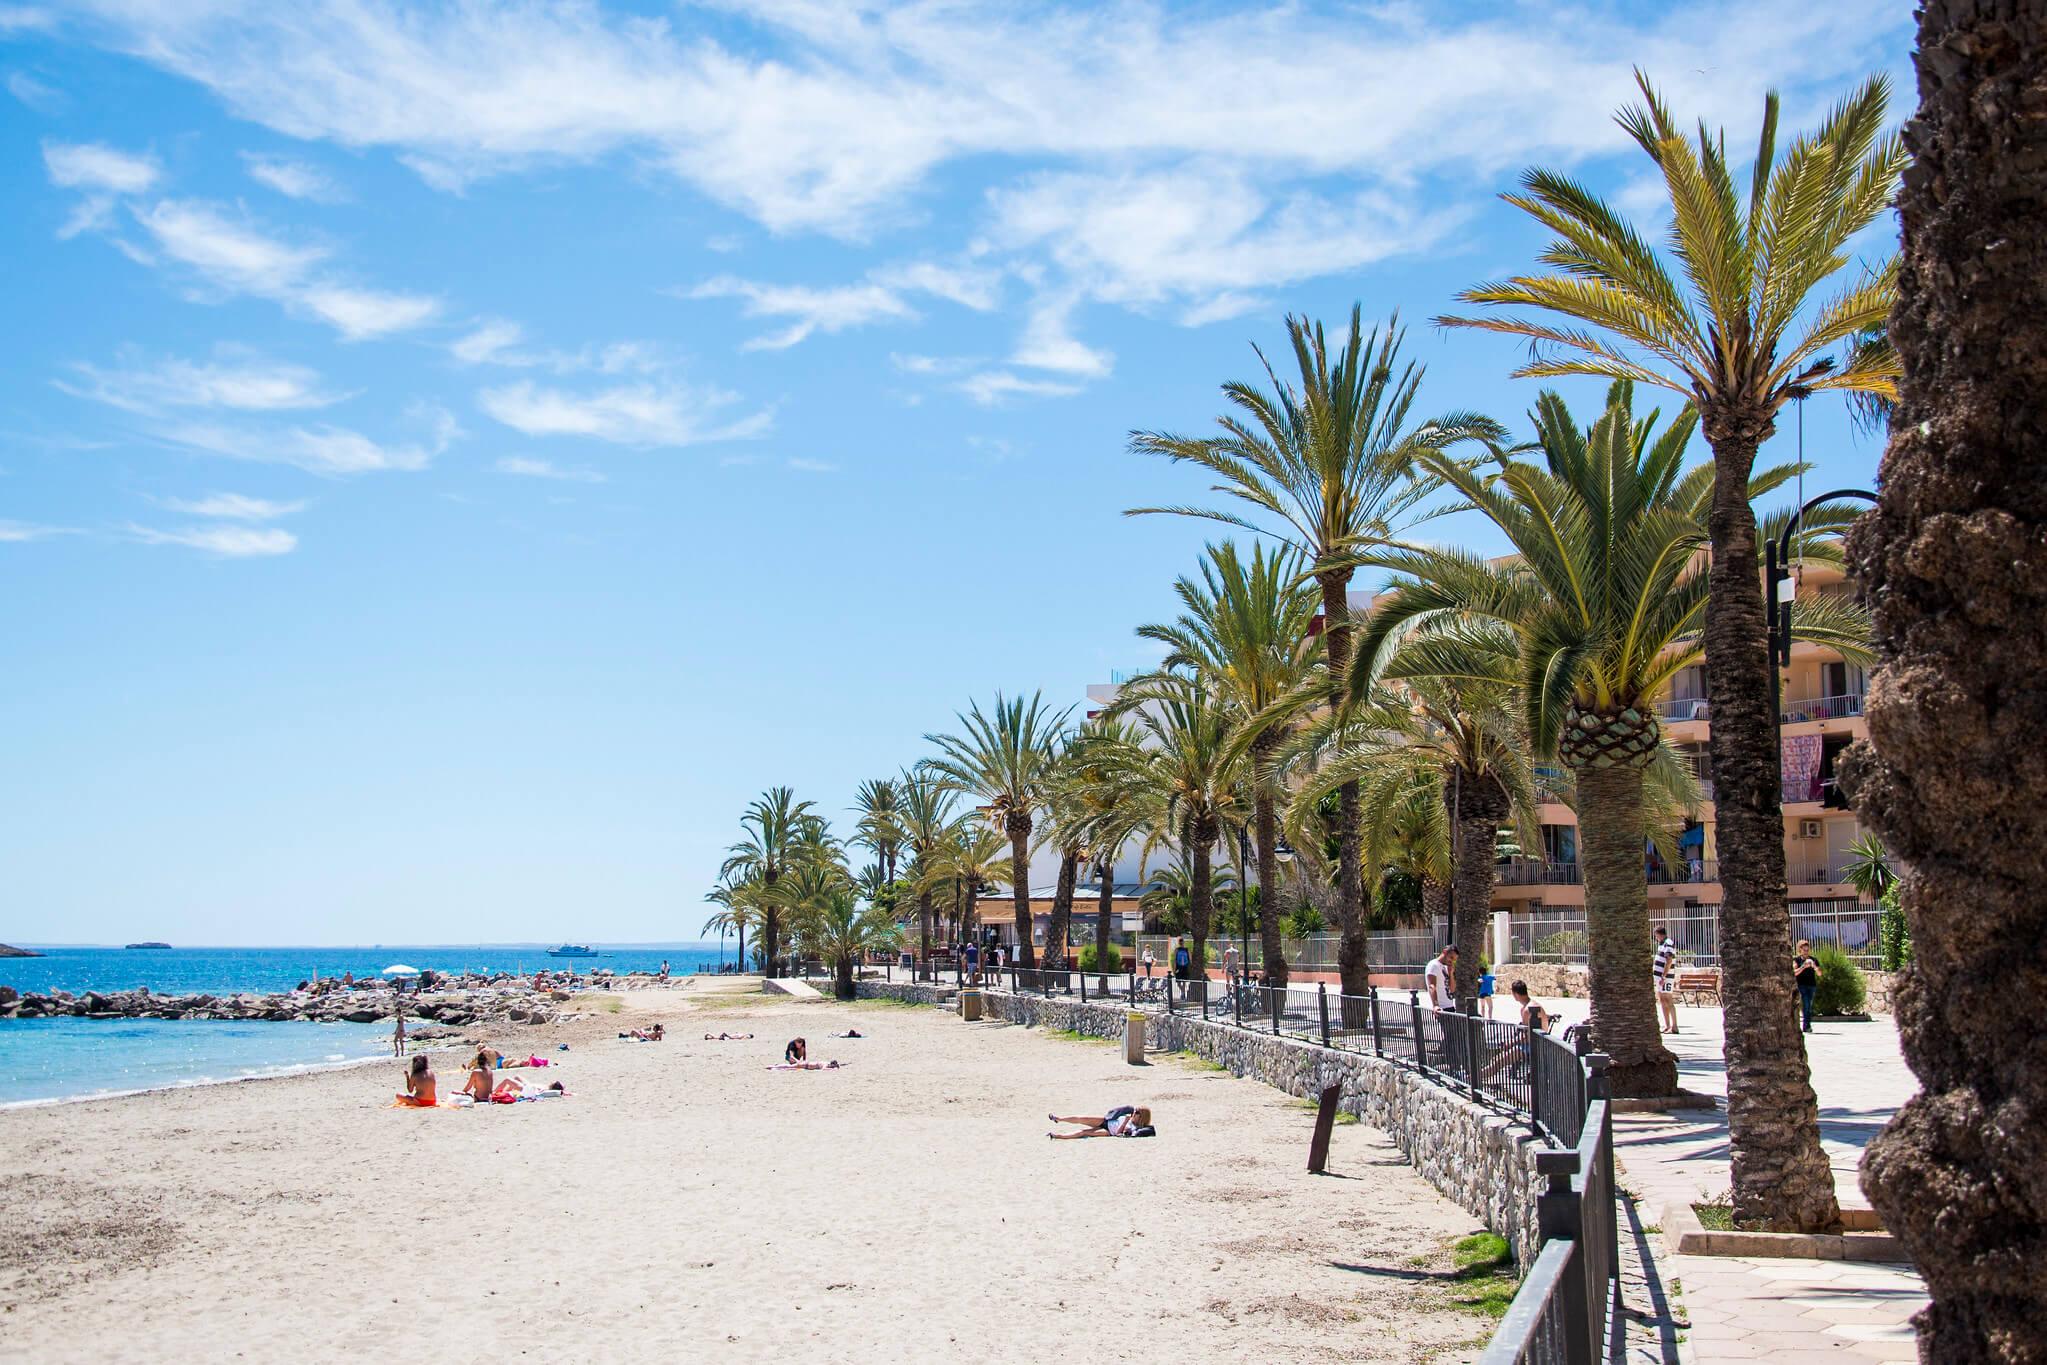 https://www.white-ibiza.com/wp-content/uploads/2020/03/ibiza-beaches-figueretas-01.jpg